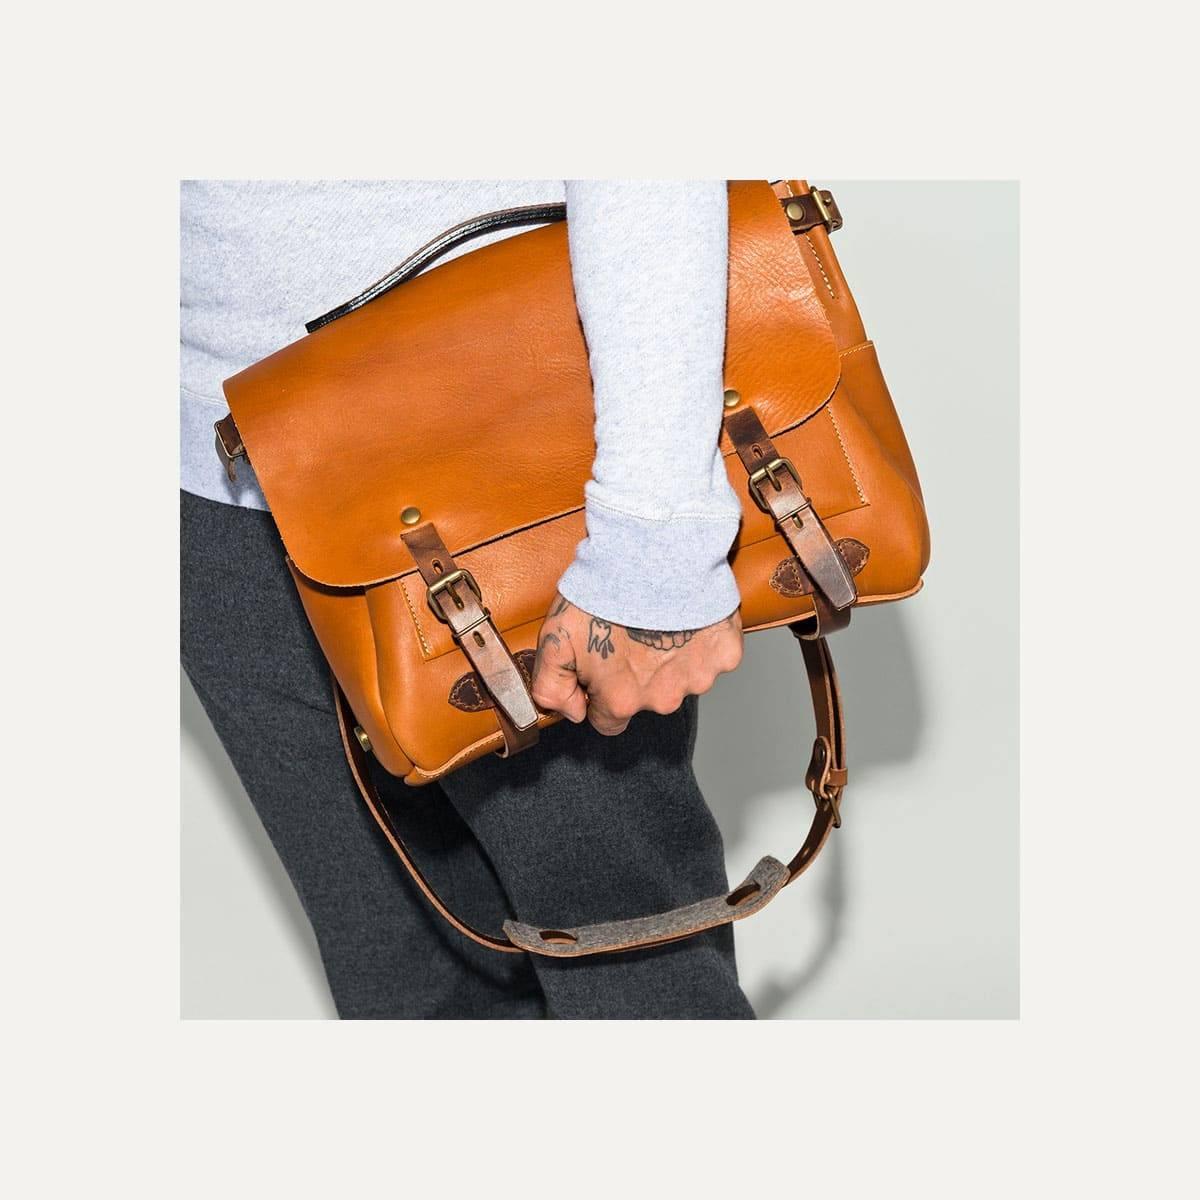 Postman bag Eclair M - Pain brulé  (image n°10)